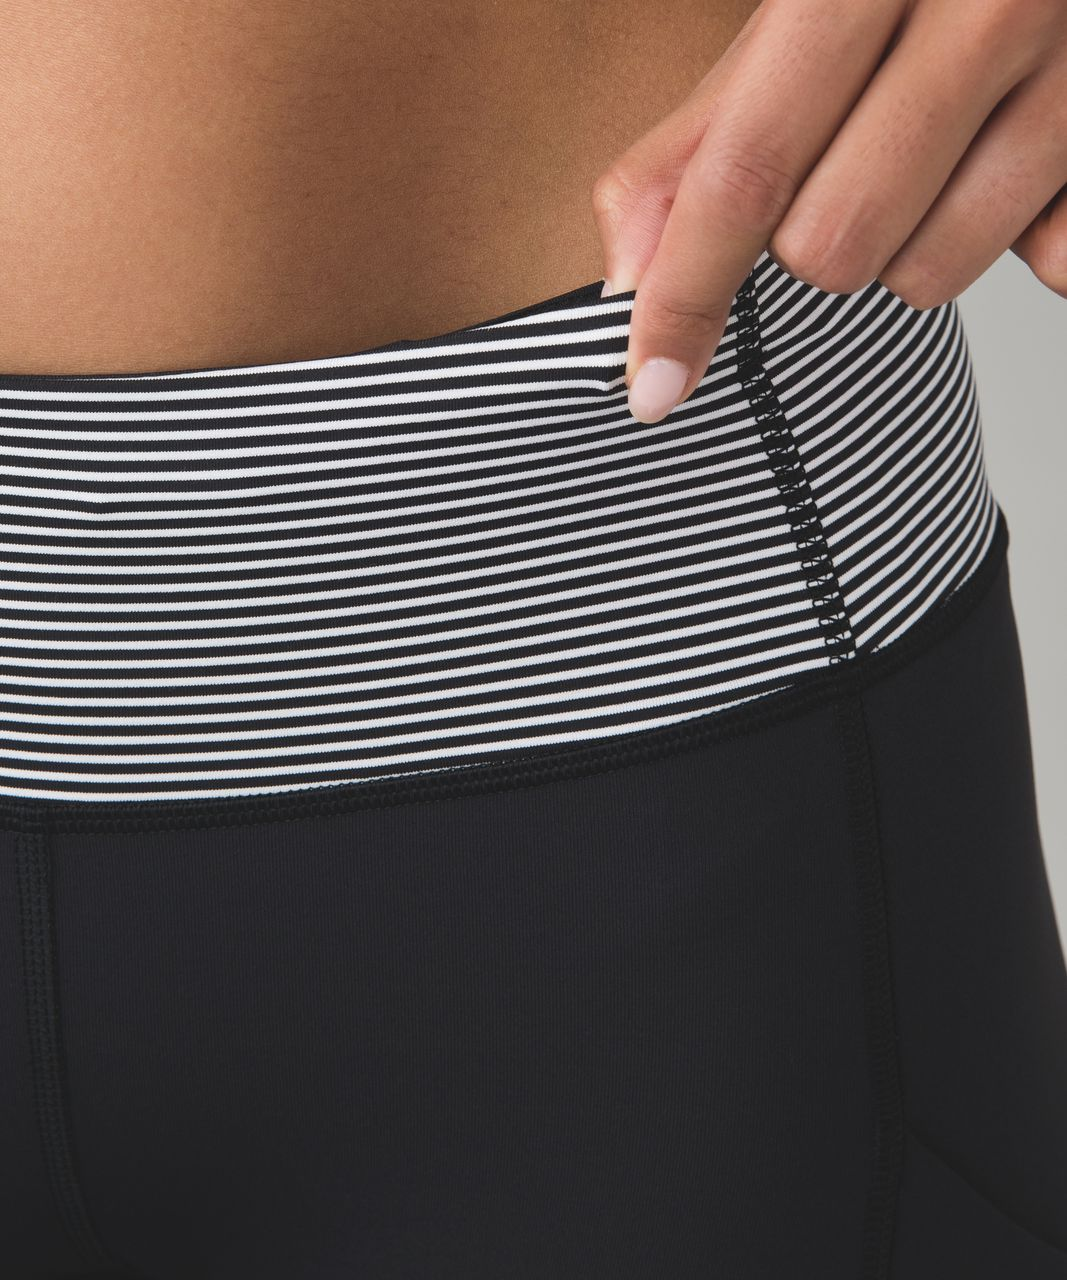 Lululemon Speed Tight IV *Brushed - Black / Mini Pop Stripe Black White